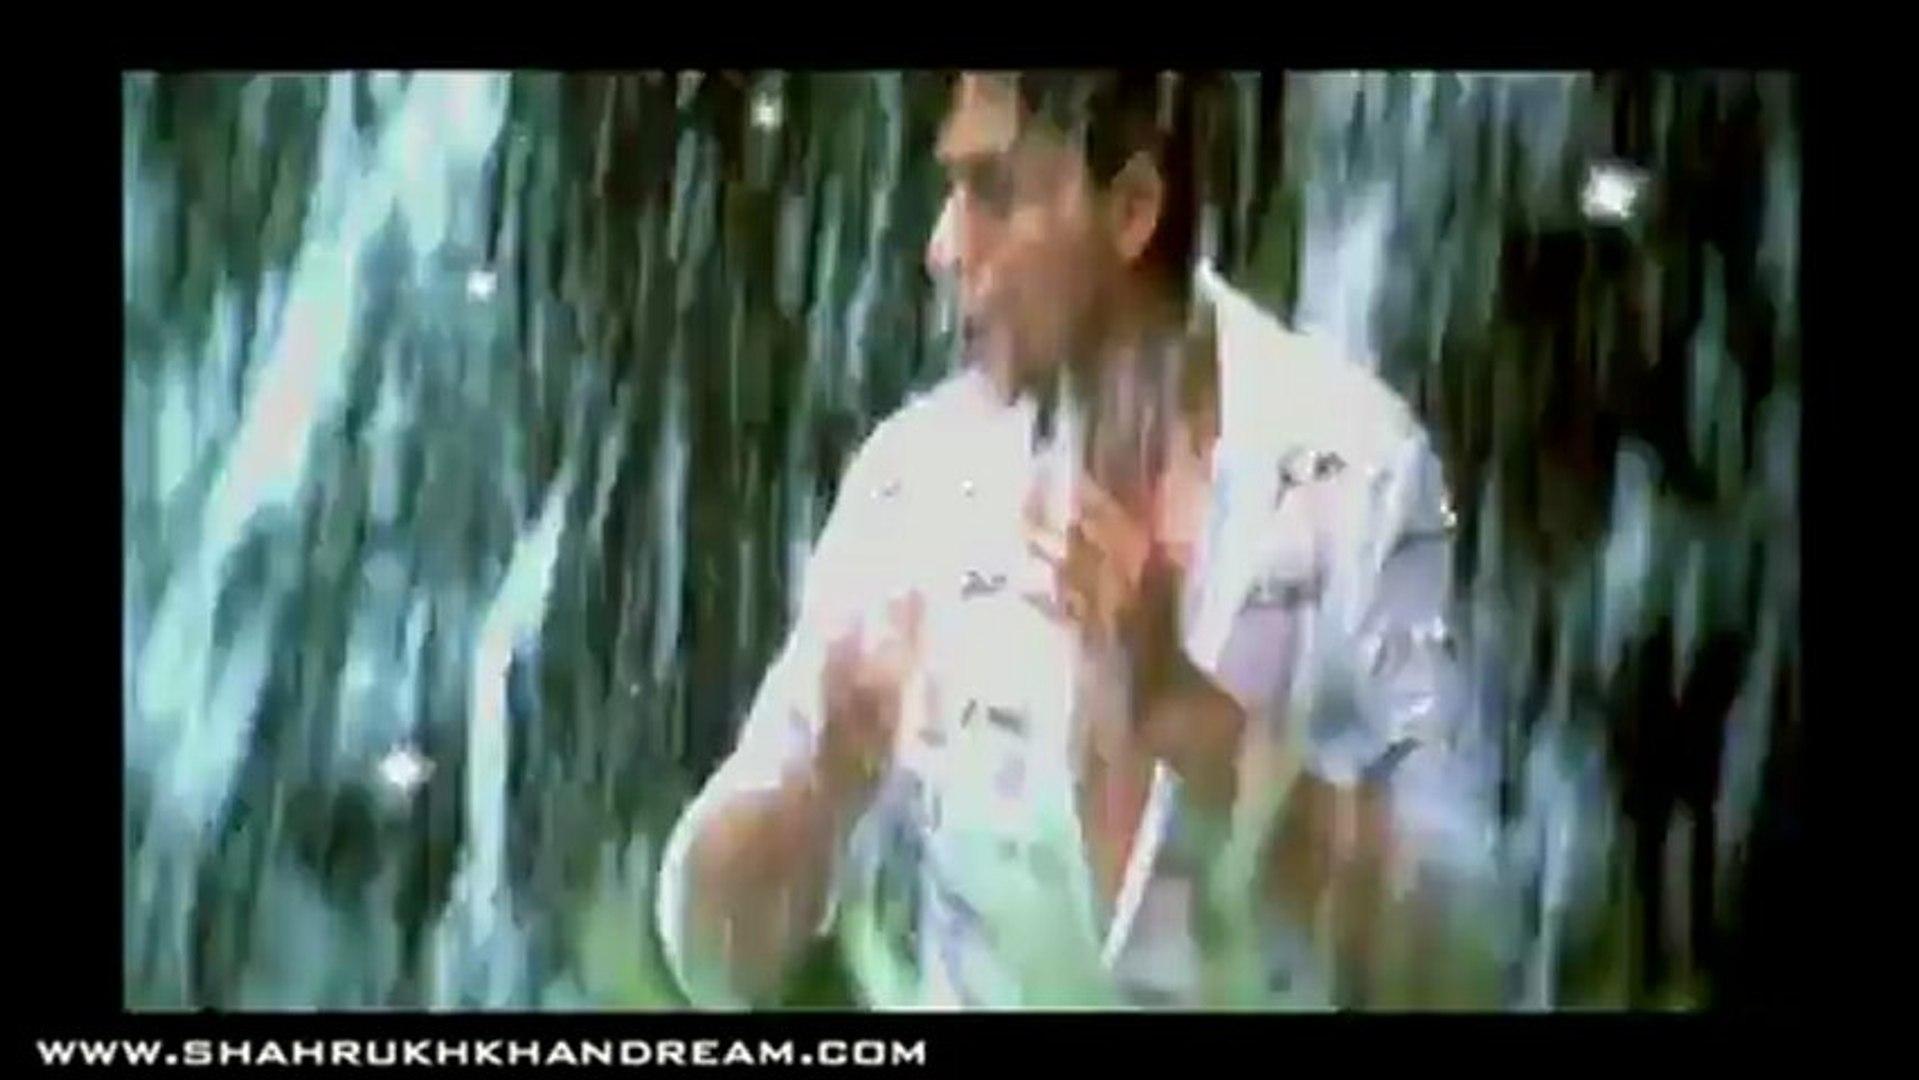 Shahrukh Khan Я хочу к тебе (БанДерос)